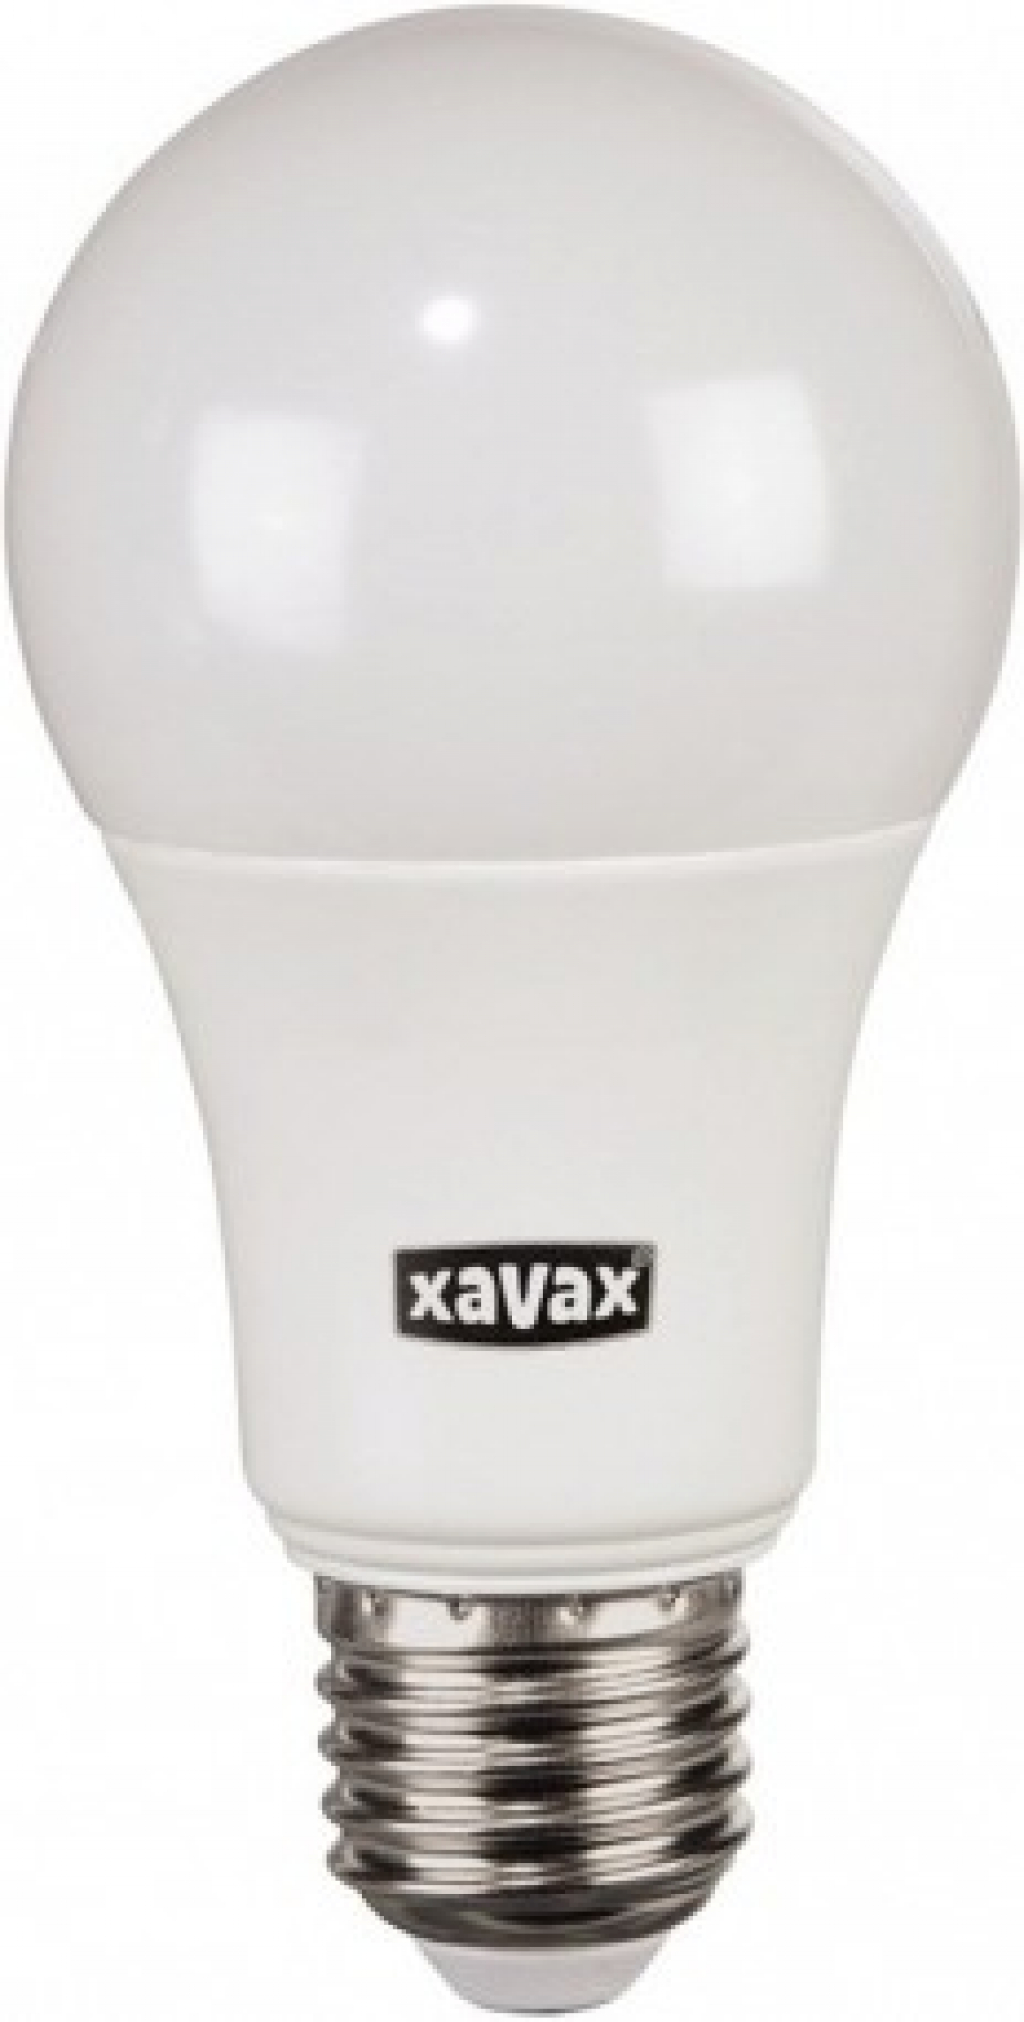 Крушка Xavax 112179 LED 9.5W, E27, 2700K